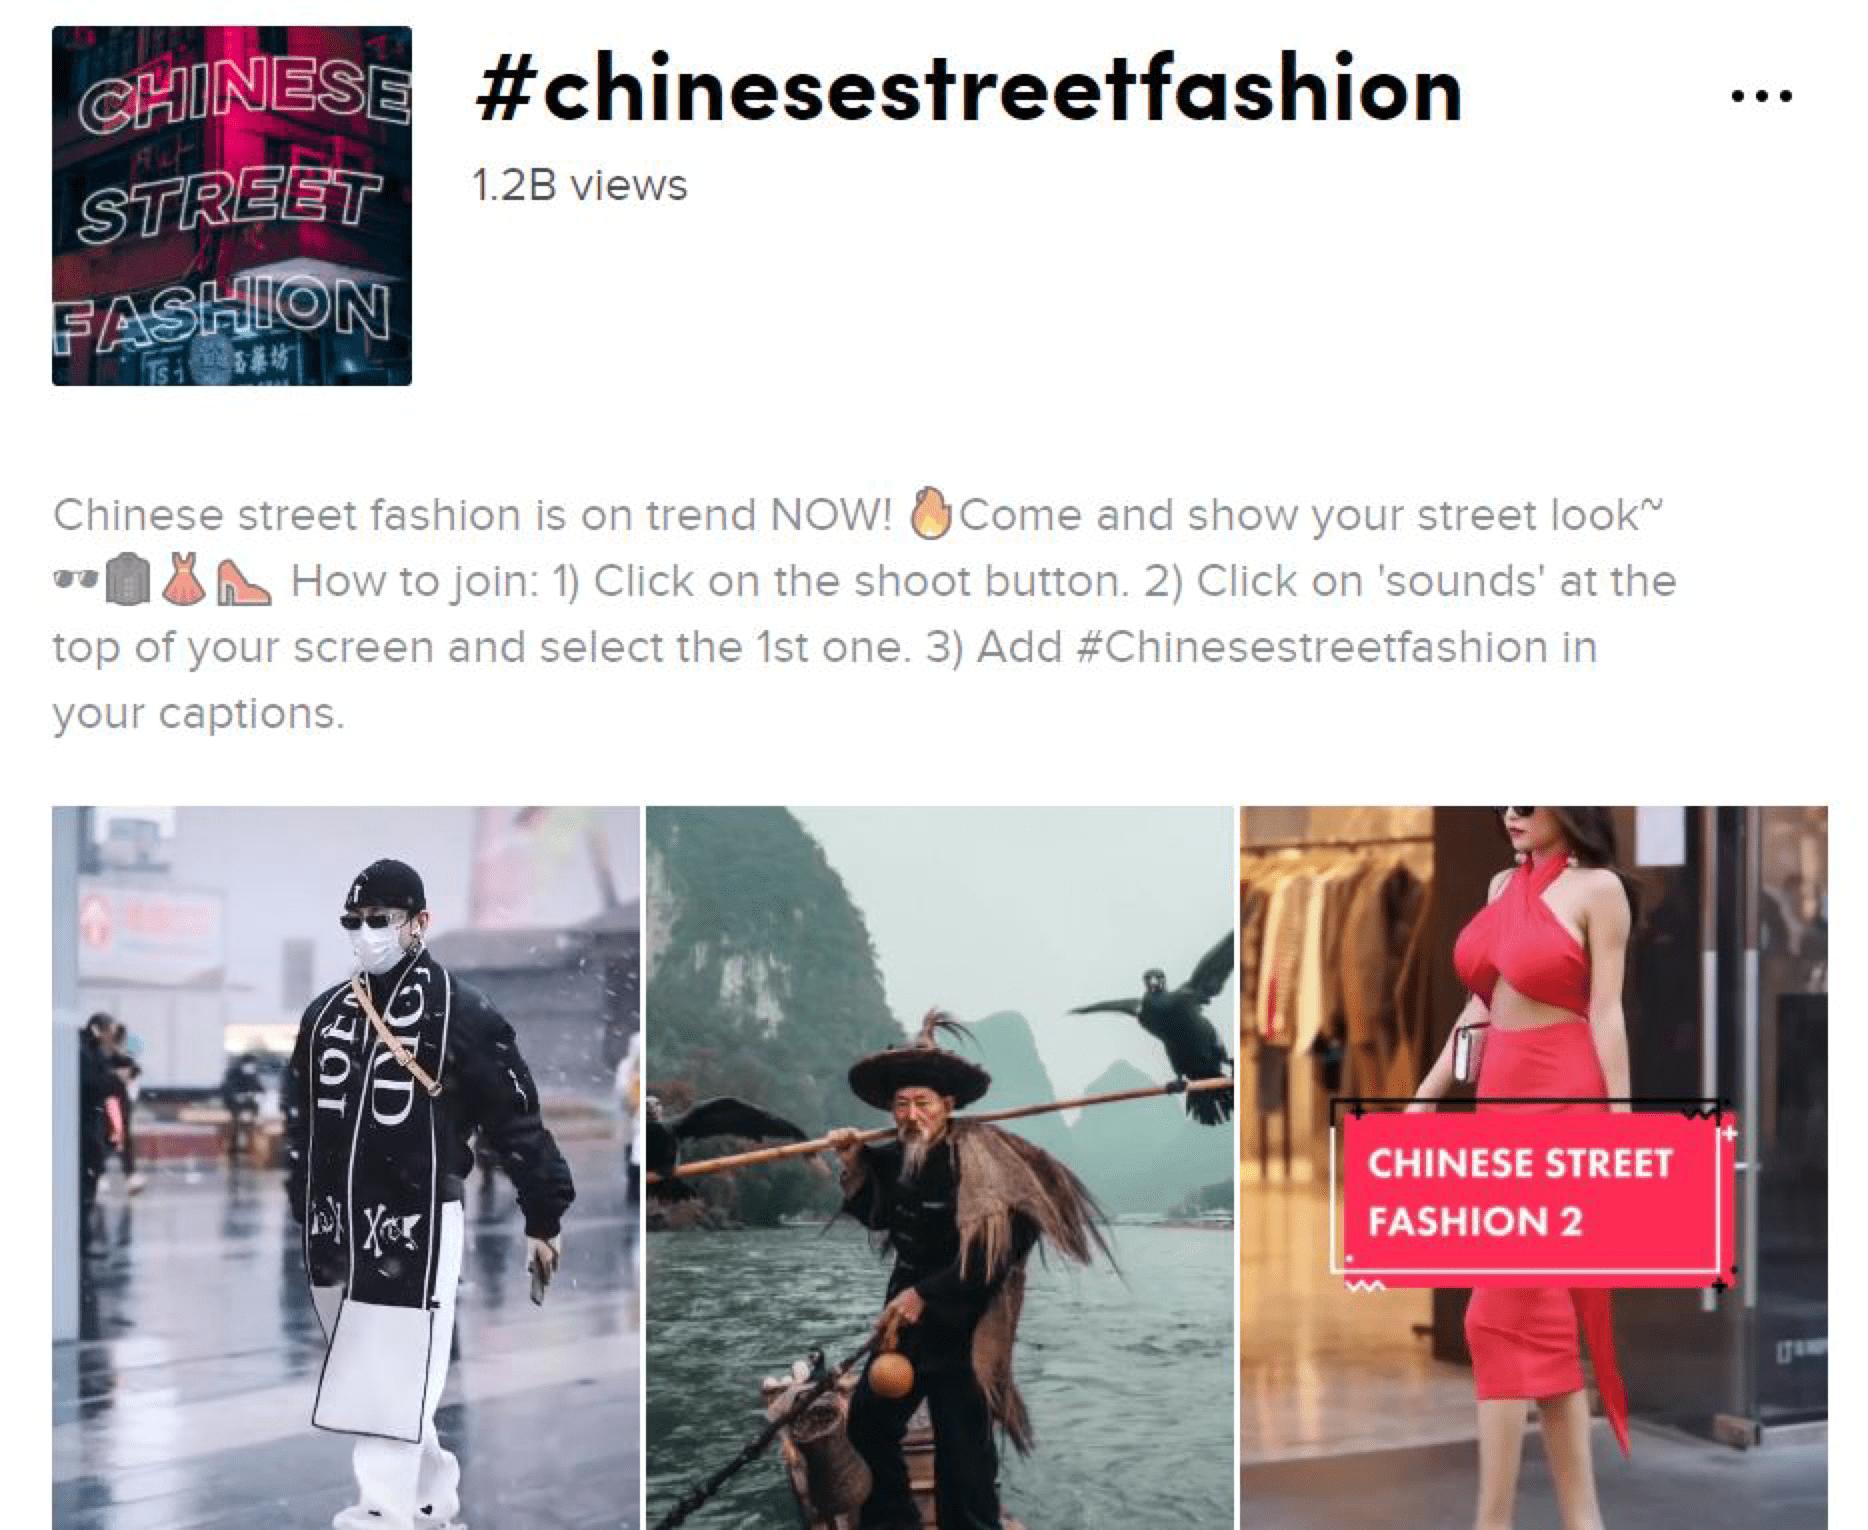 TikTok播放量12亿次,中国街拍时尚走红海外